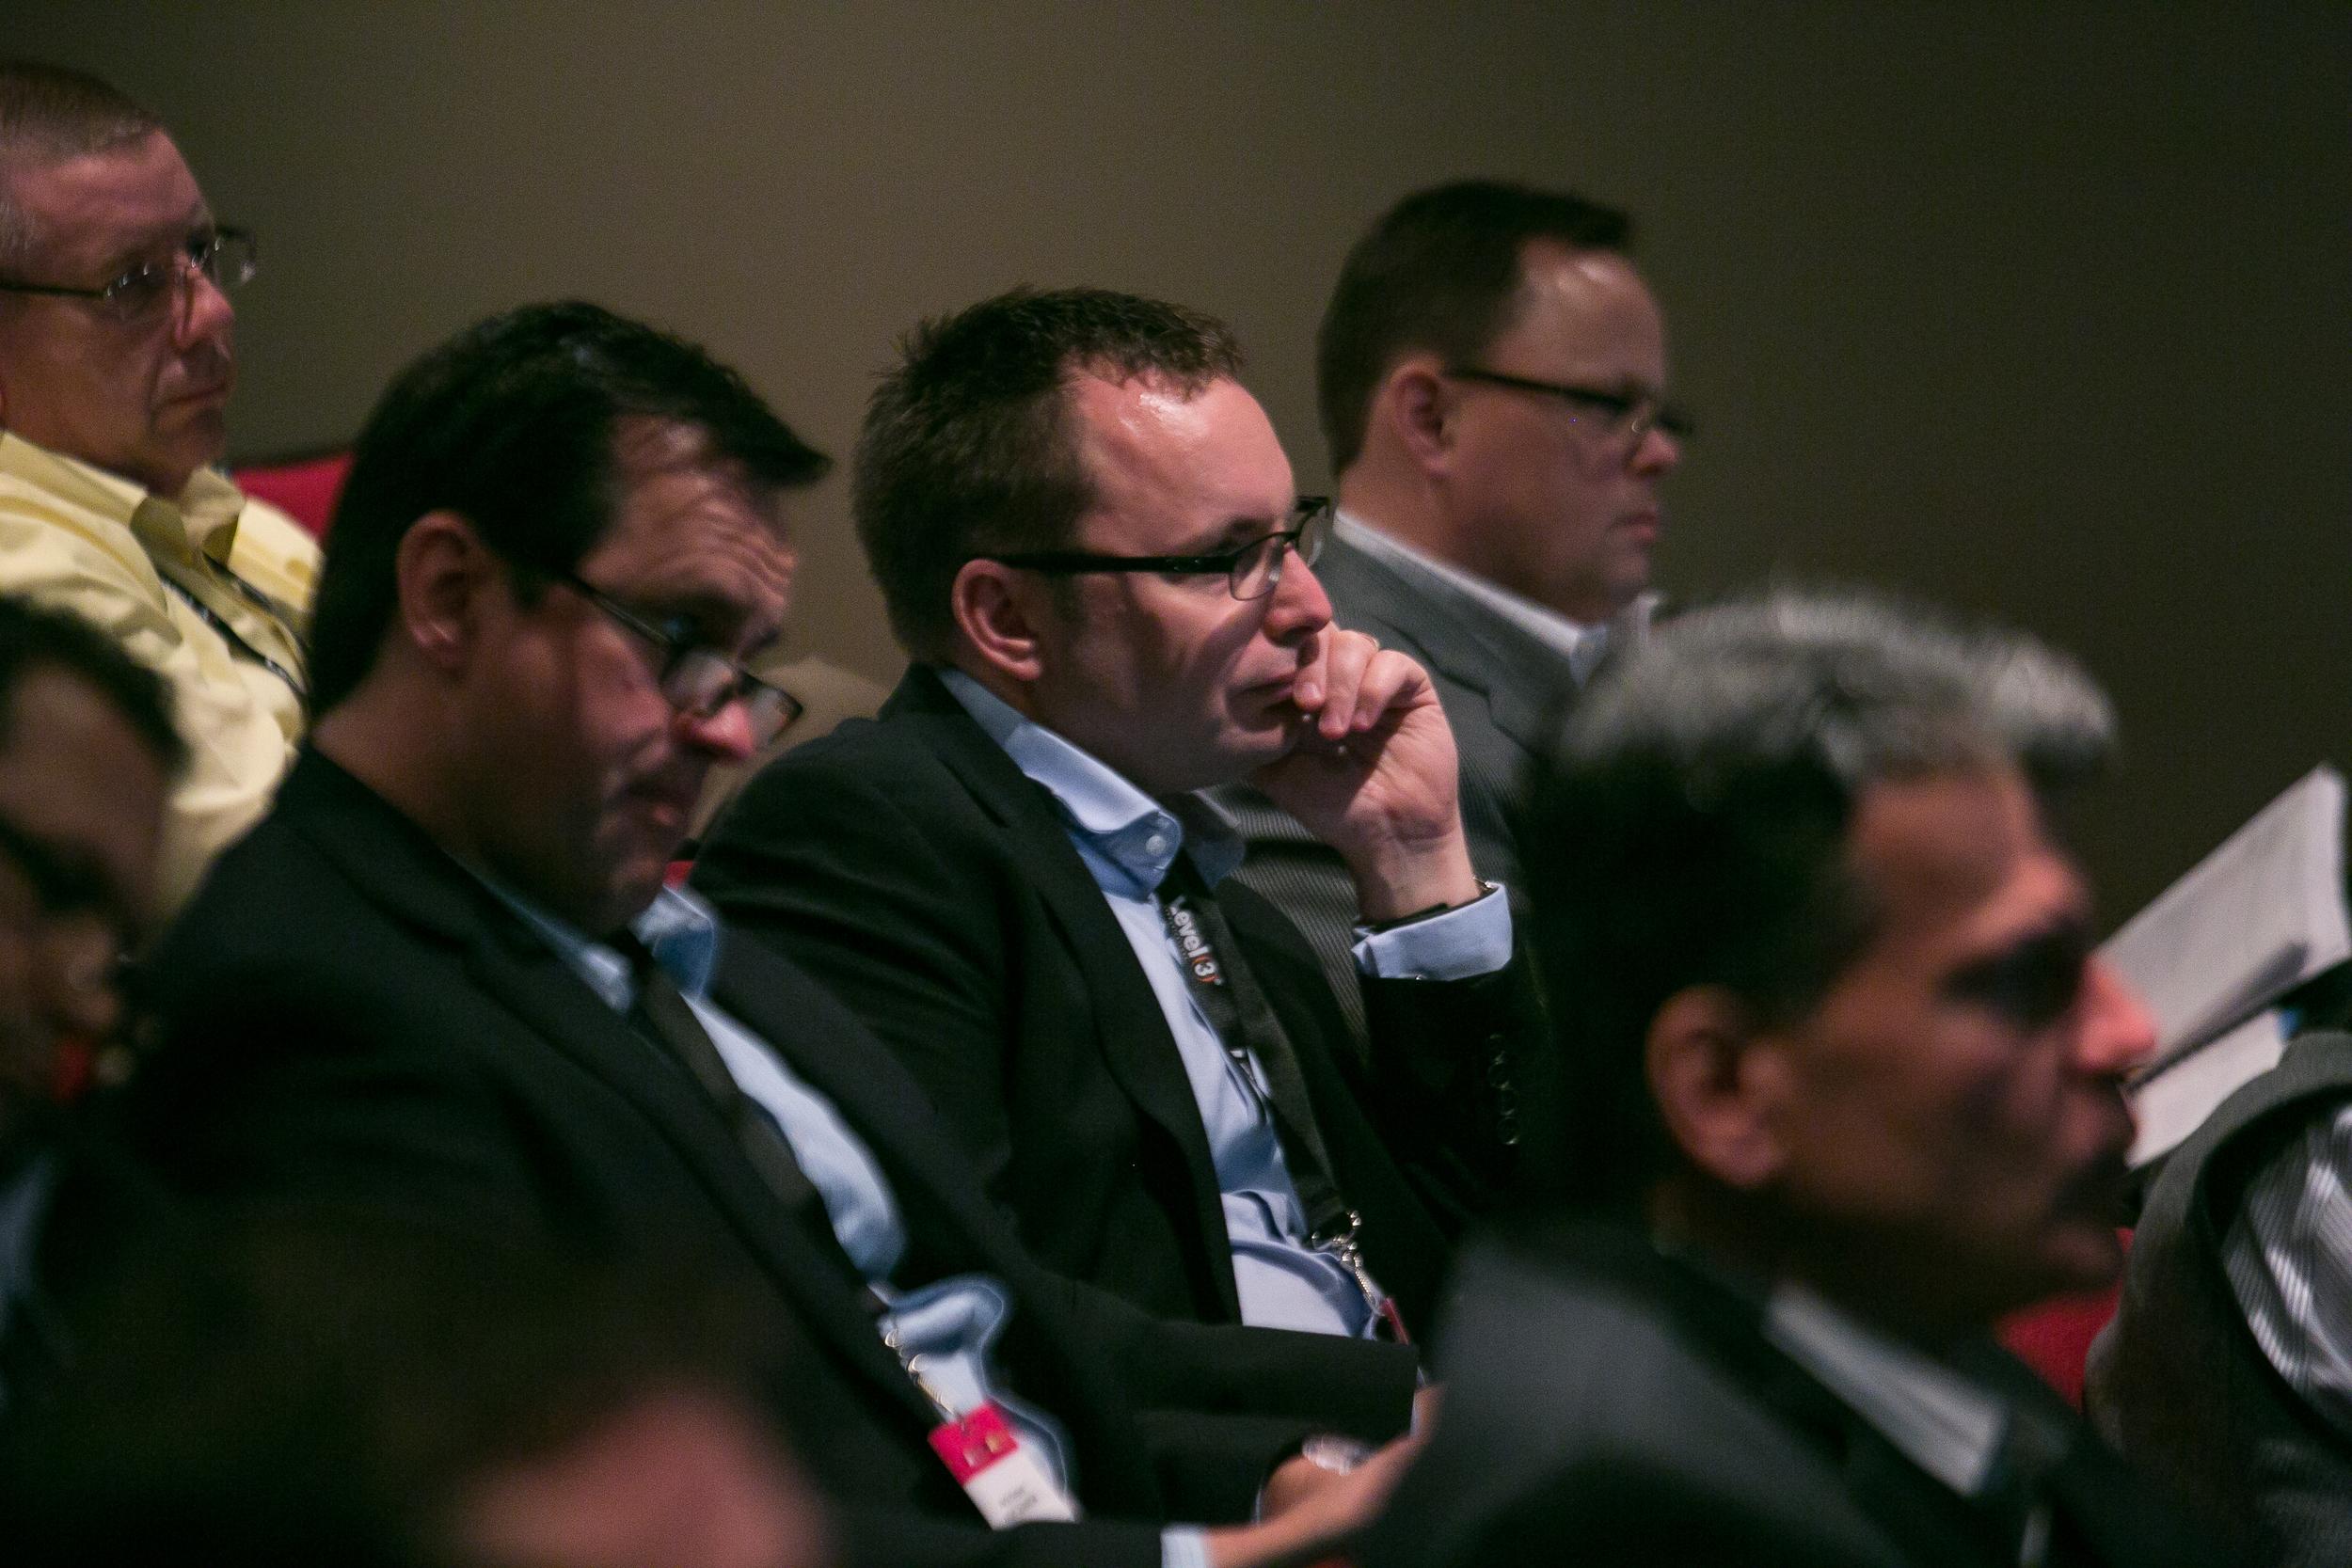 098-Capacity_Conferences-WAN_Summit-042715-6P9A0203.jpg